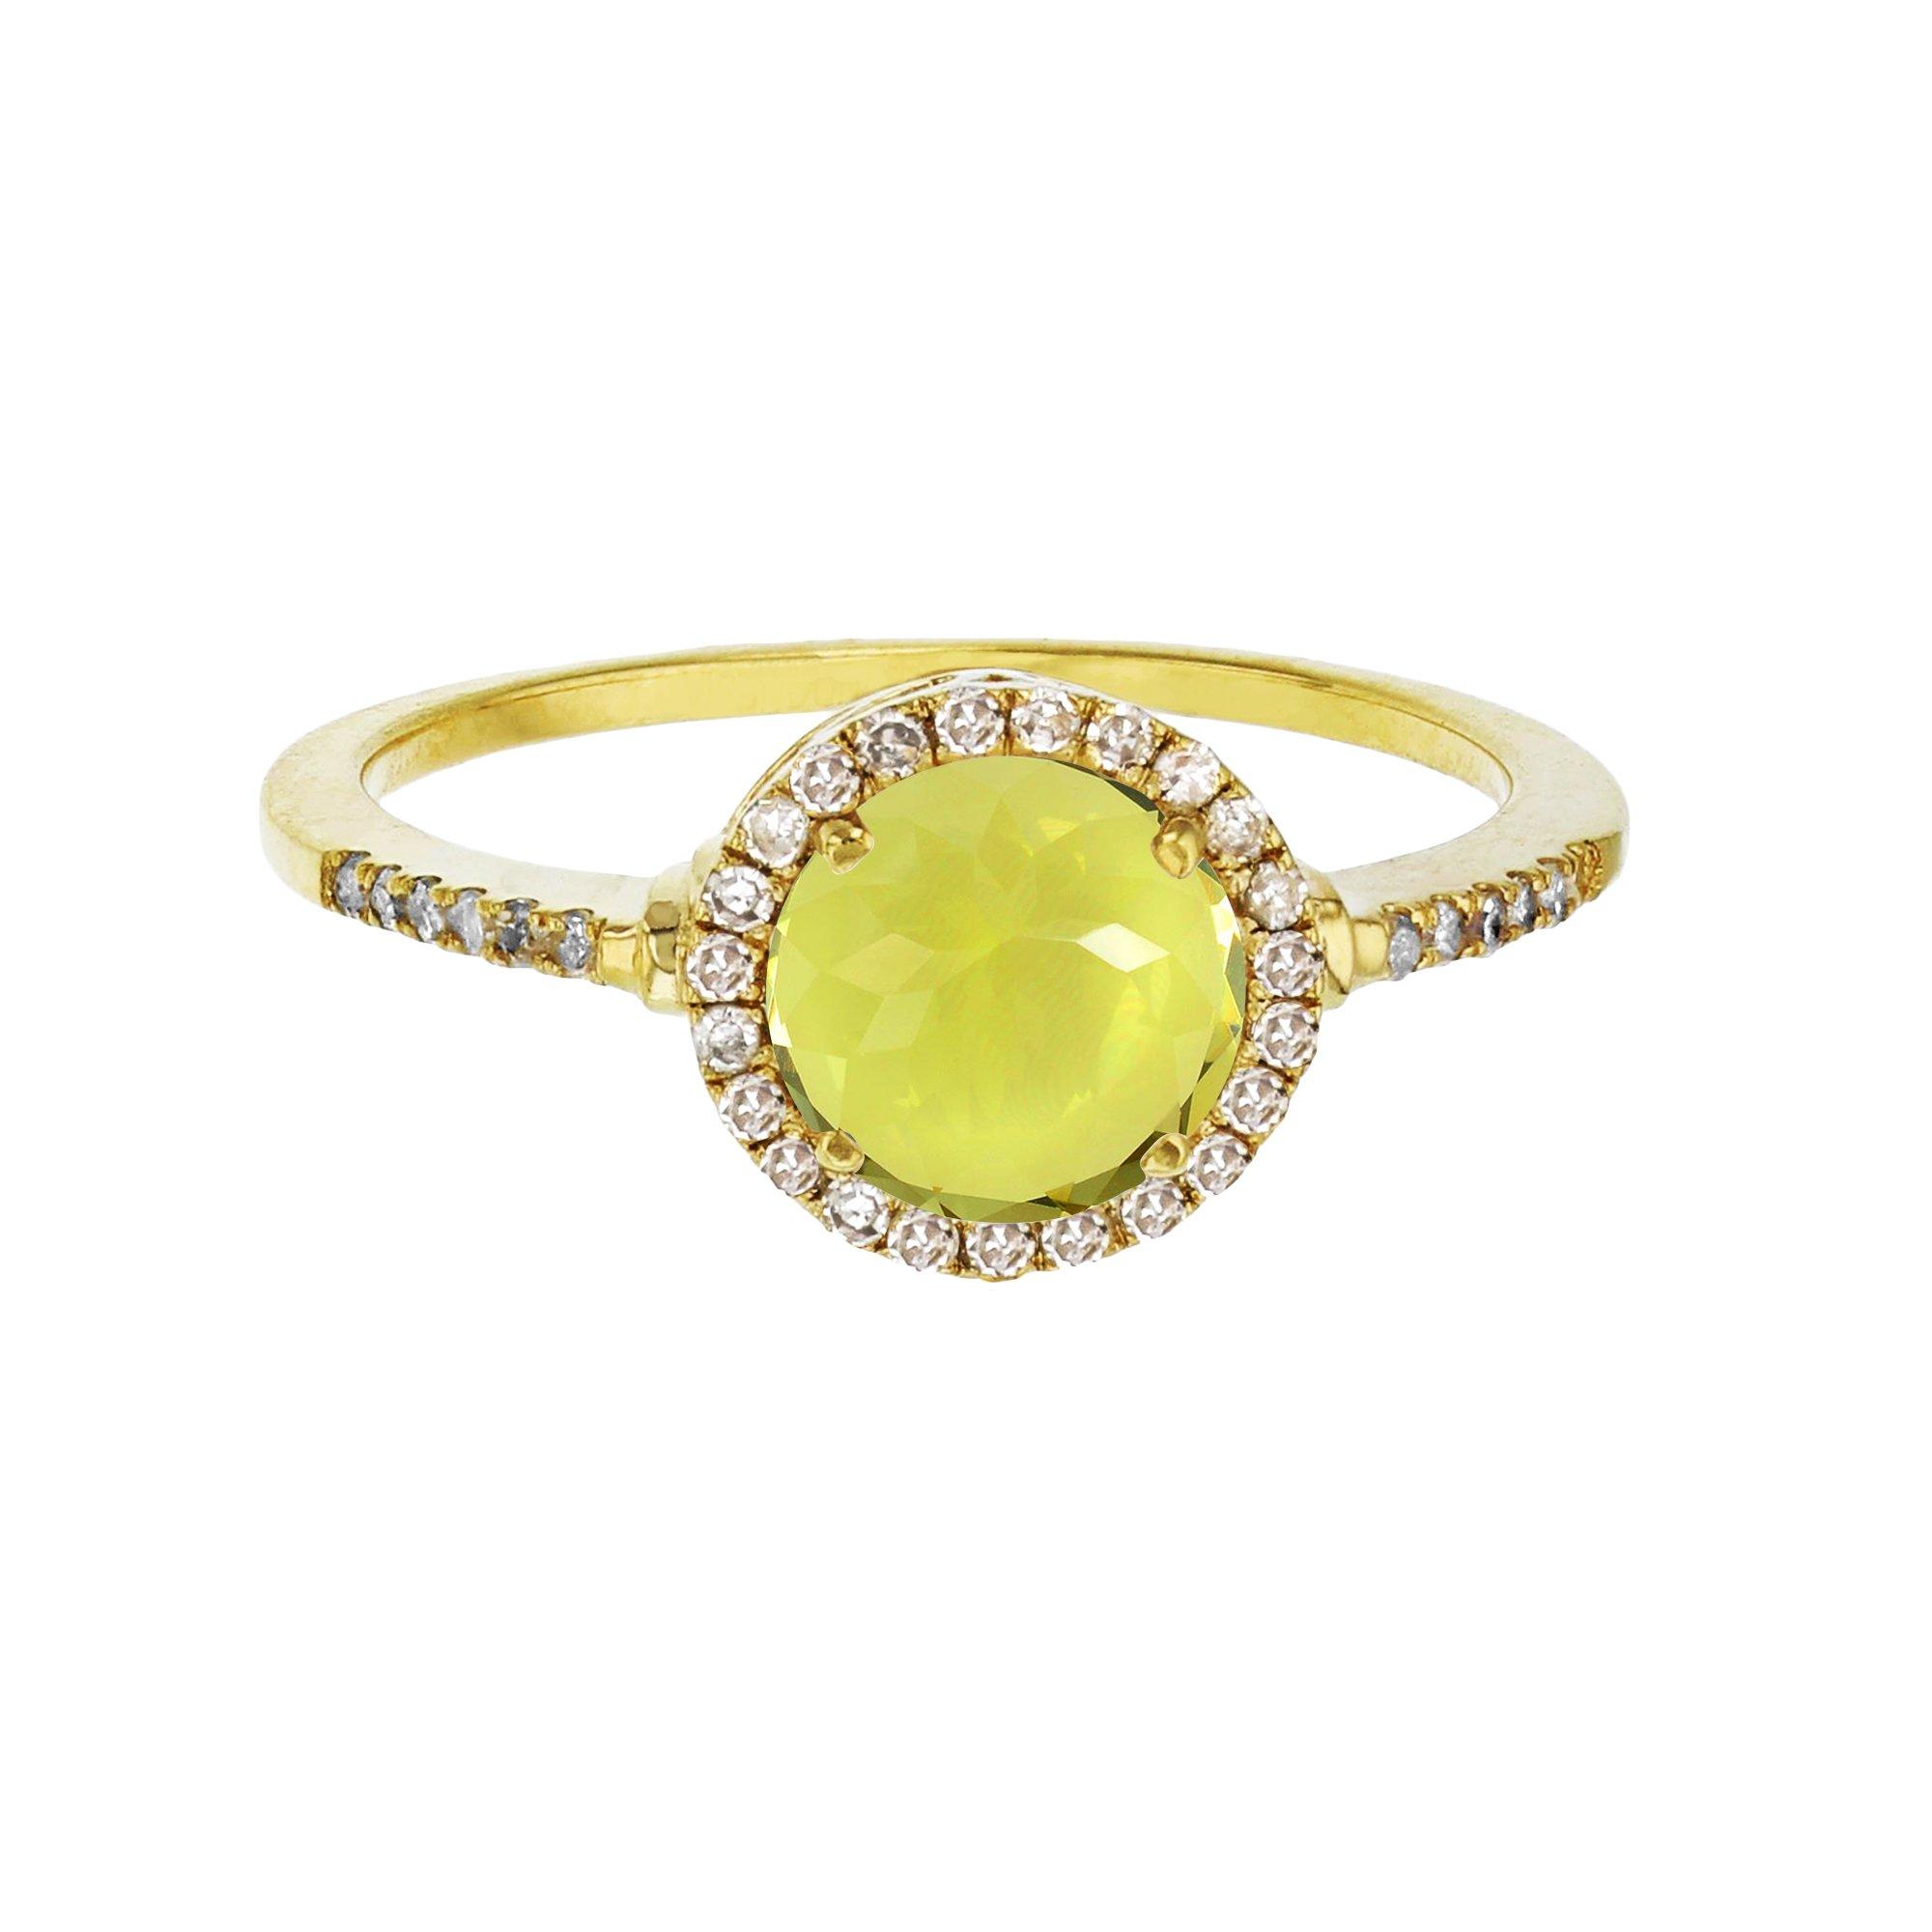 10K Yellow Gold 7mm Round Lemon Quartz & 0.18 CTTW Diamond Halo Ring by Decadence